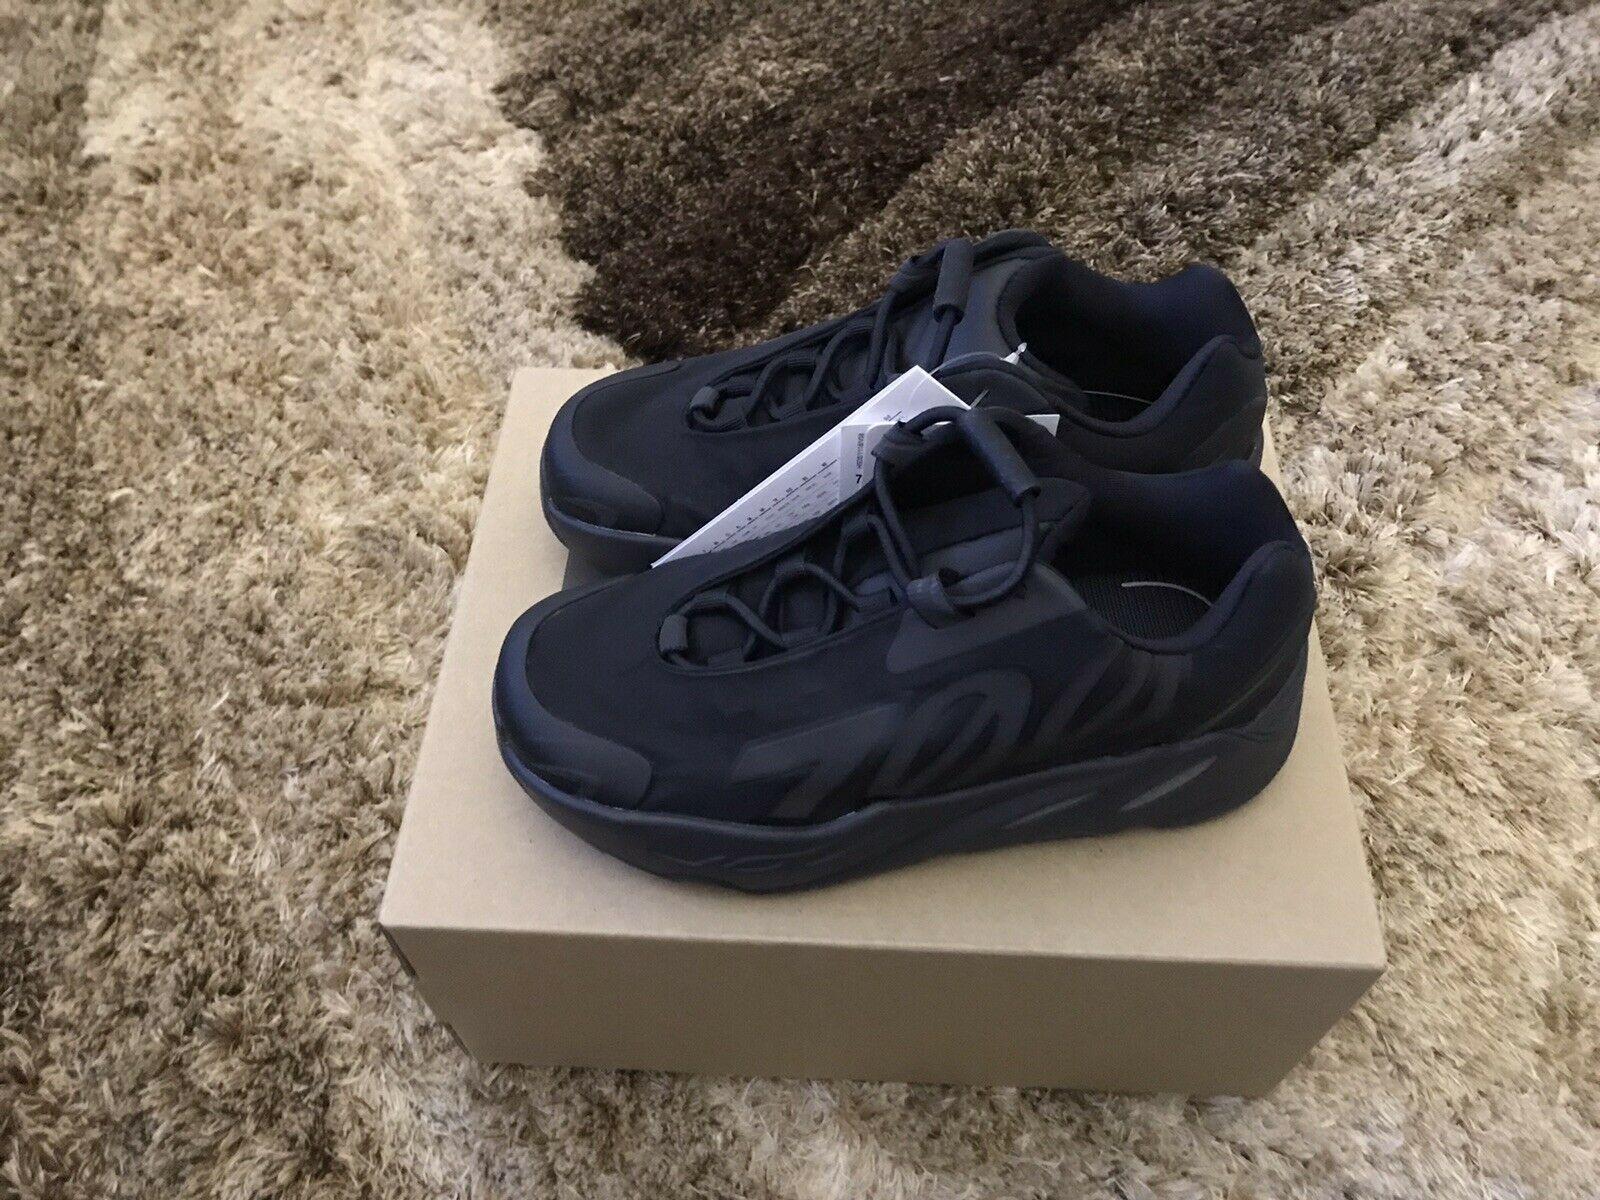 adidas Yeezy Boost 700 MNVN Black Kids